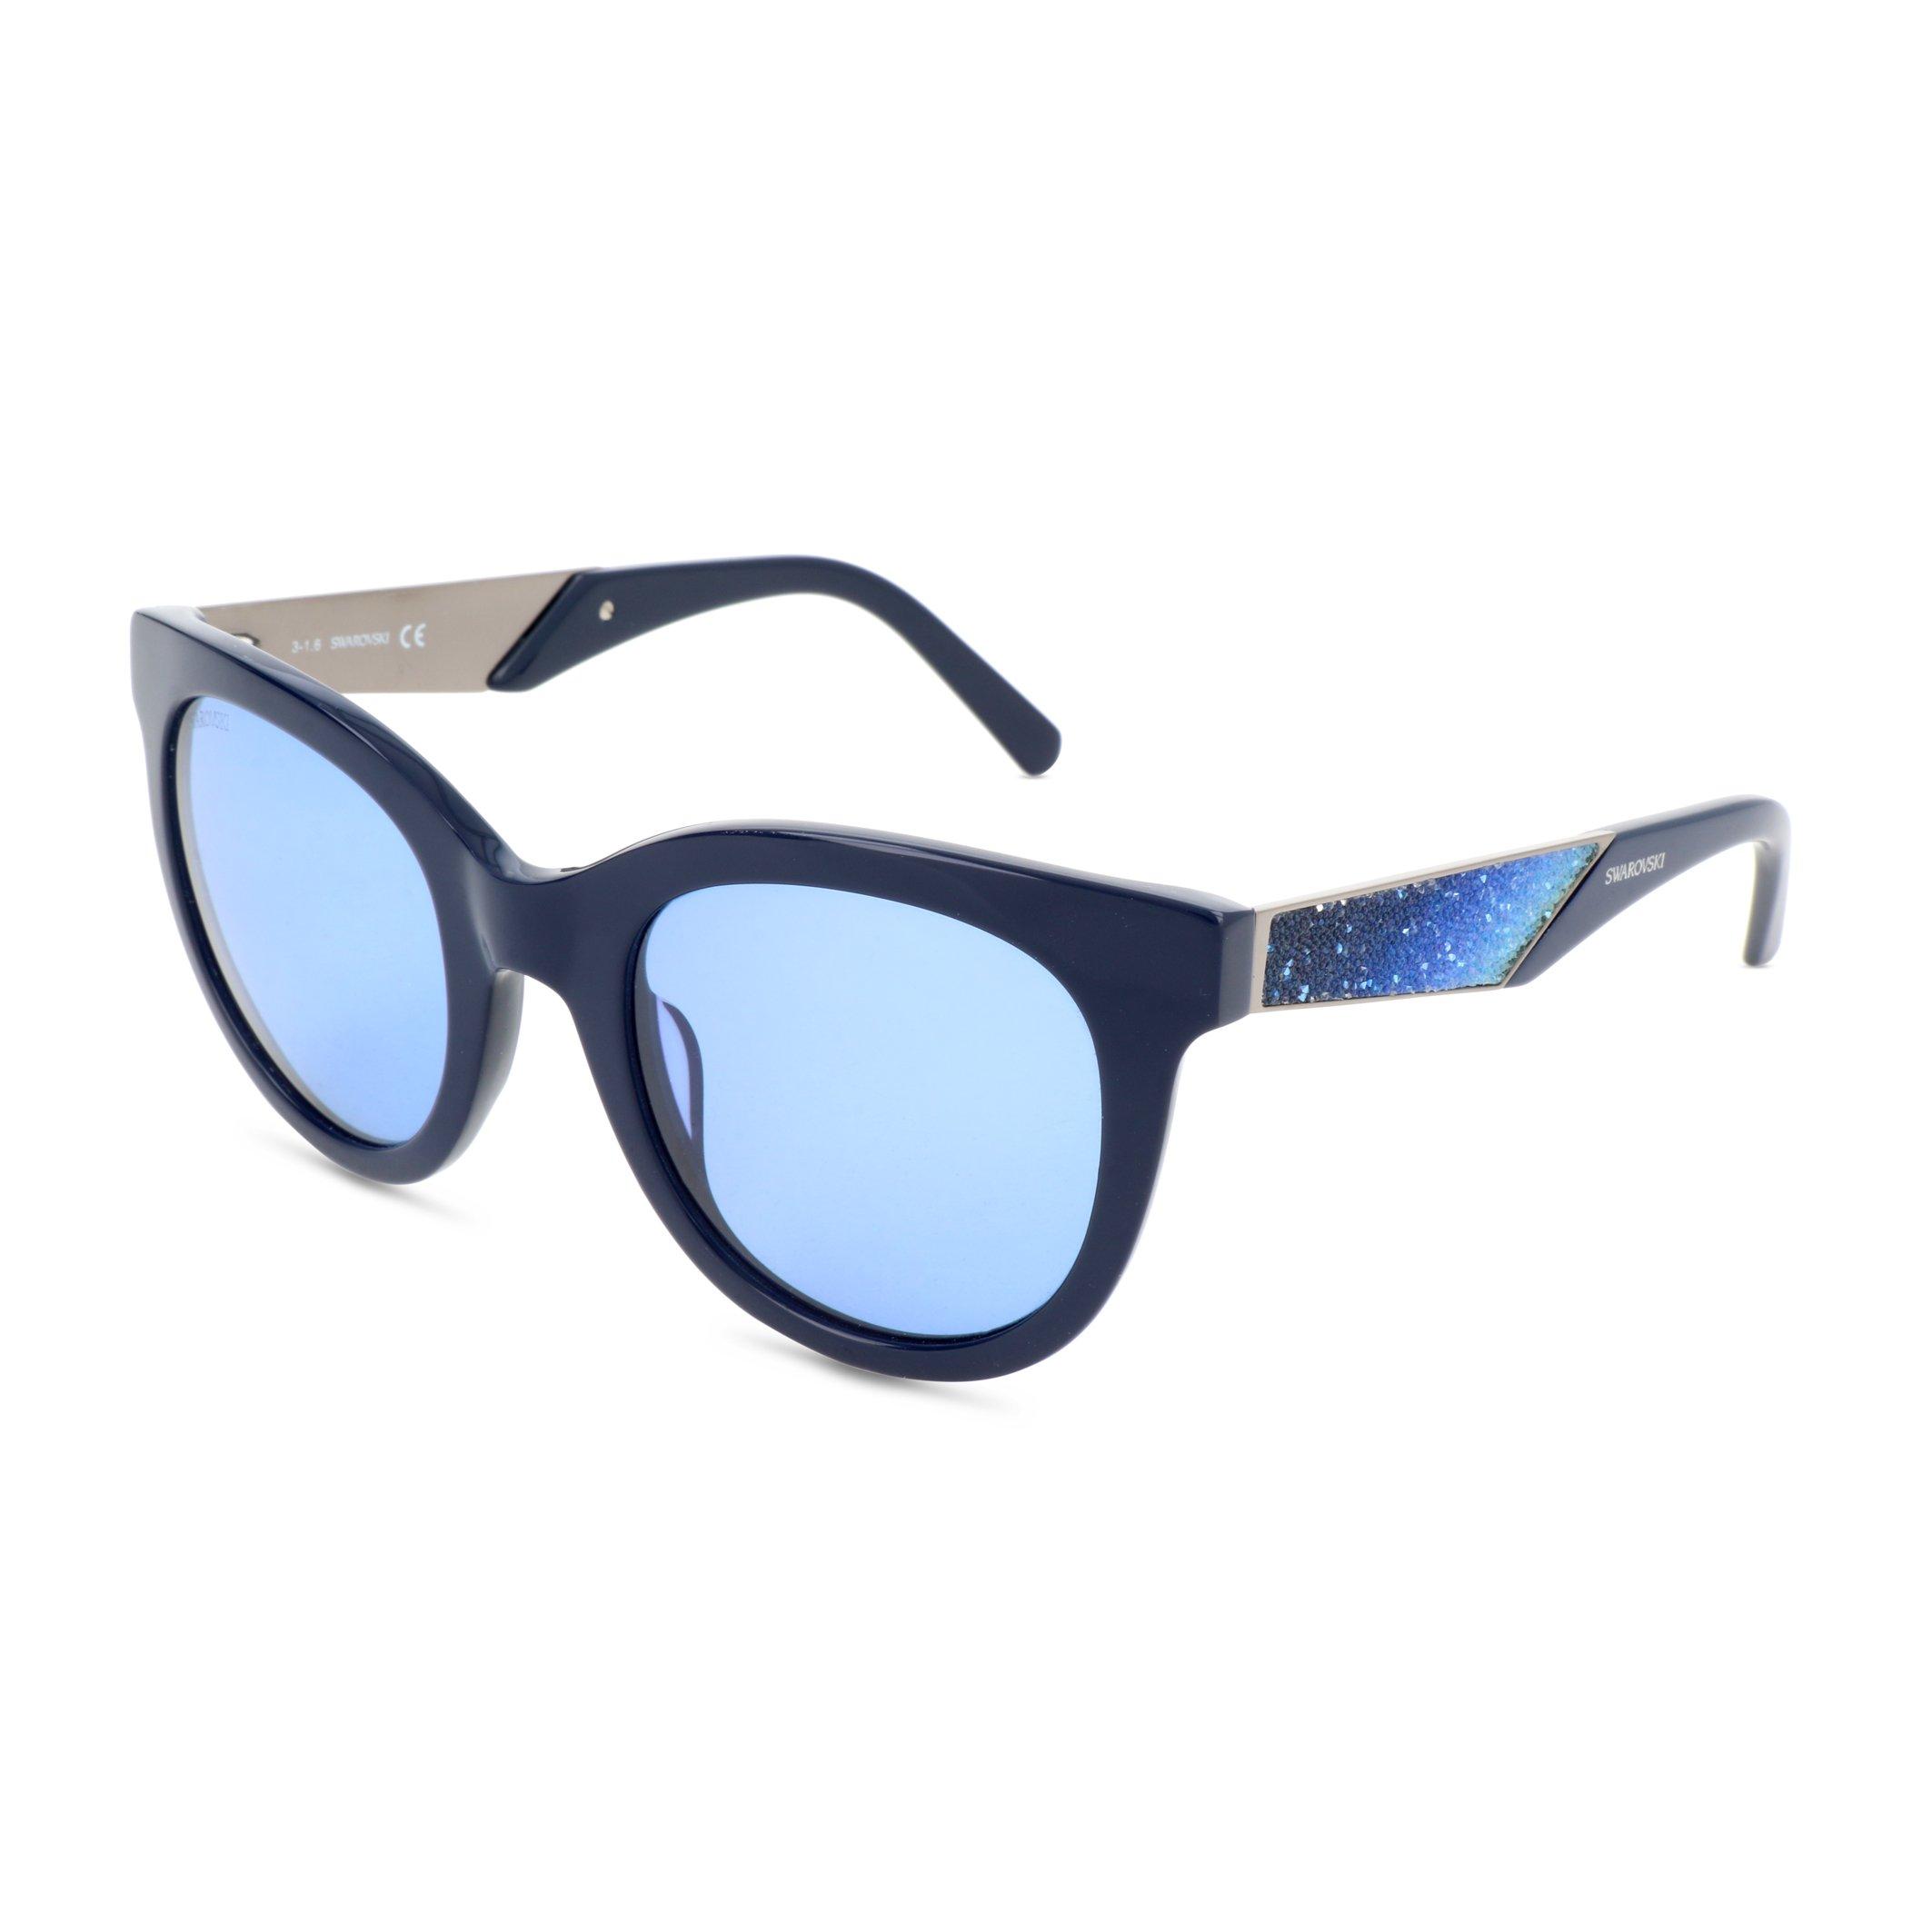 Swarovski Women's Sunglasses Black SK0126 - blue NOSIZE